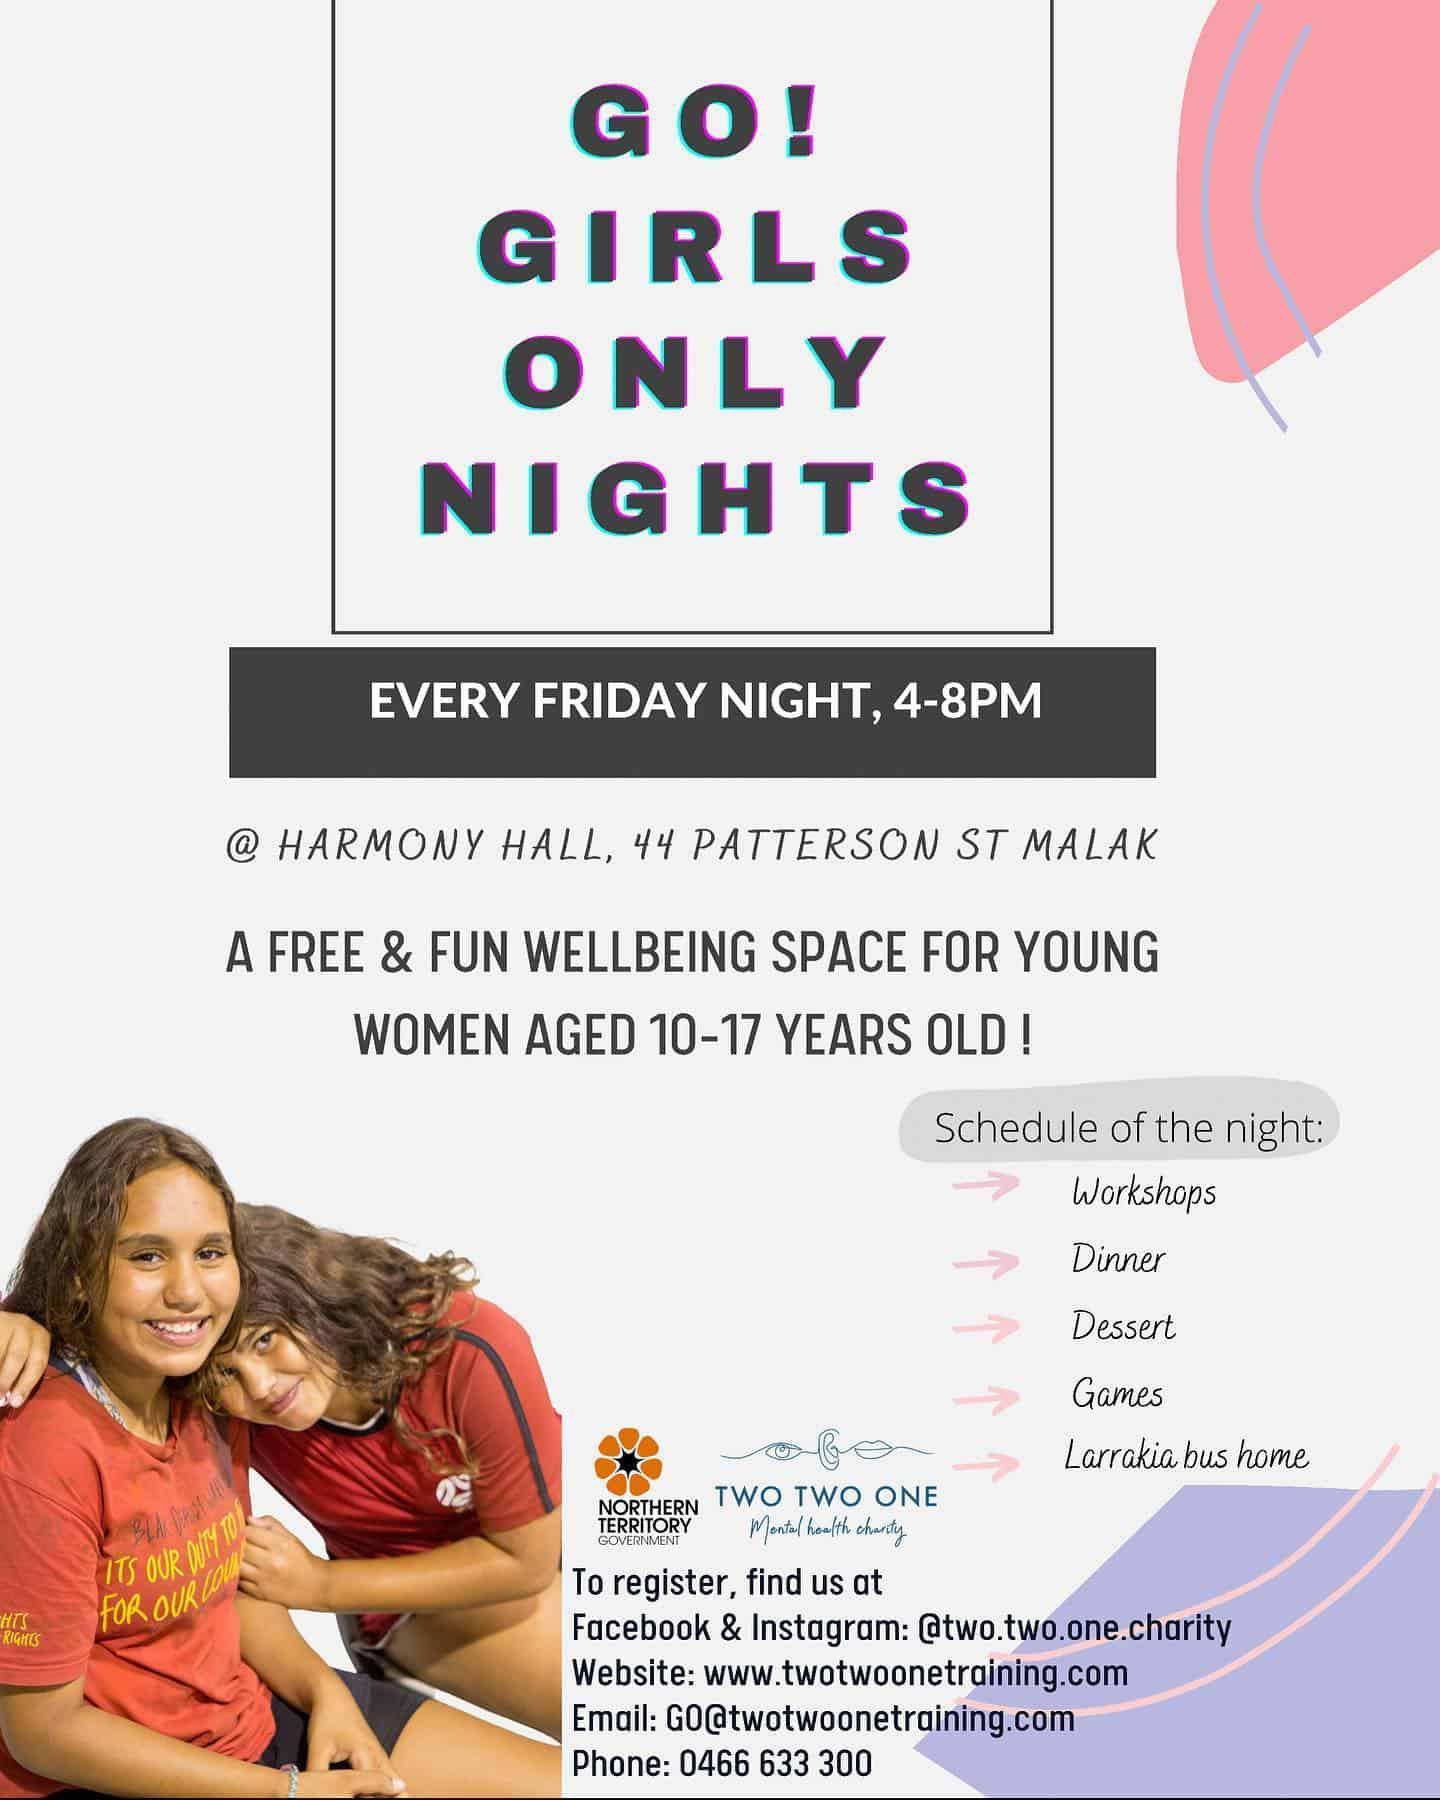 go girls only nights